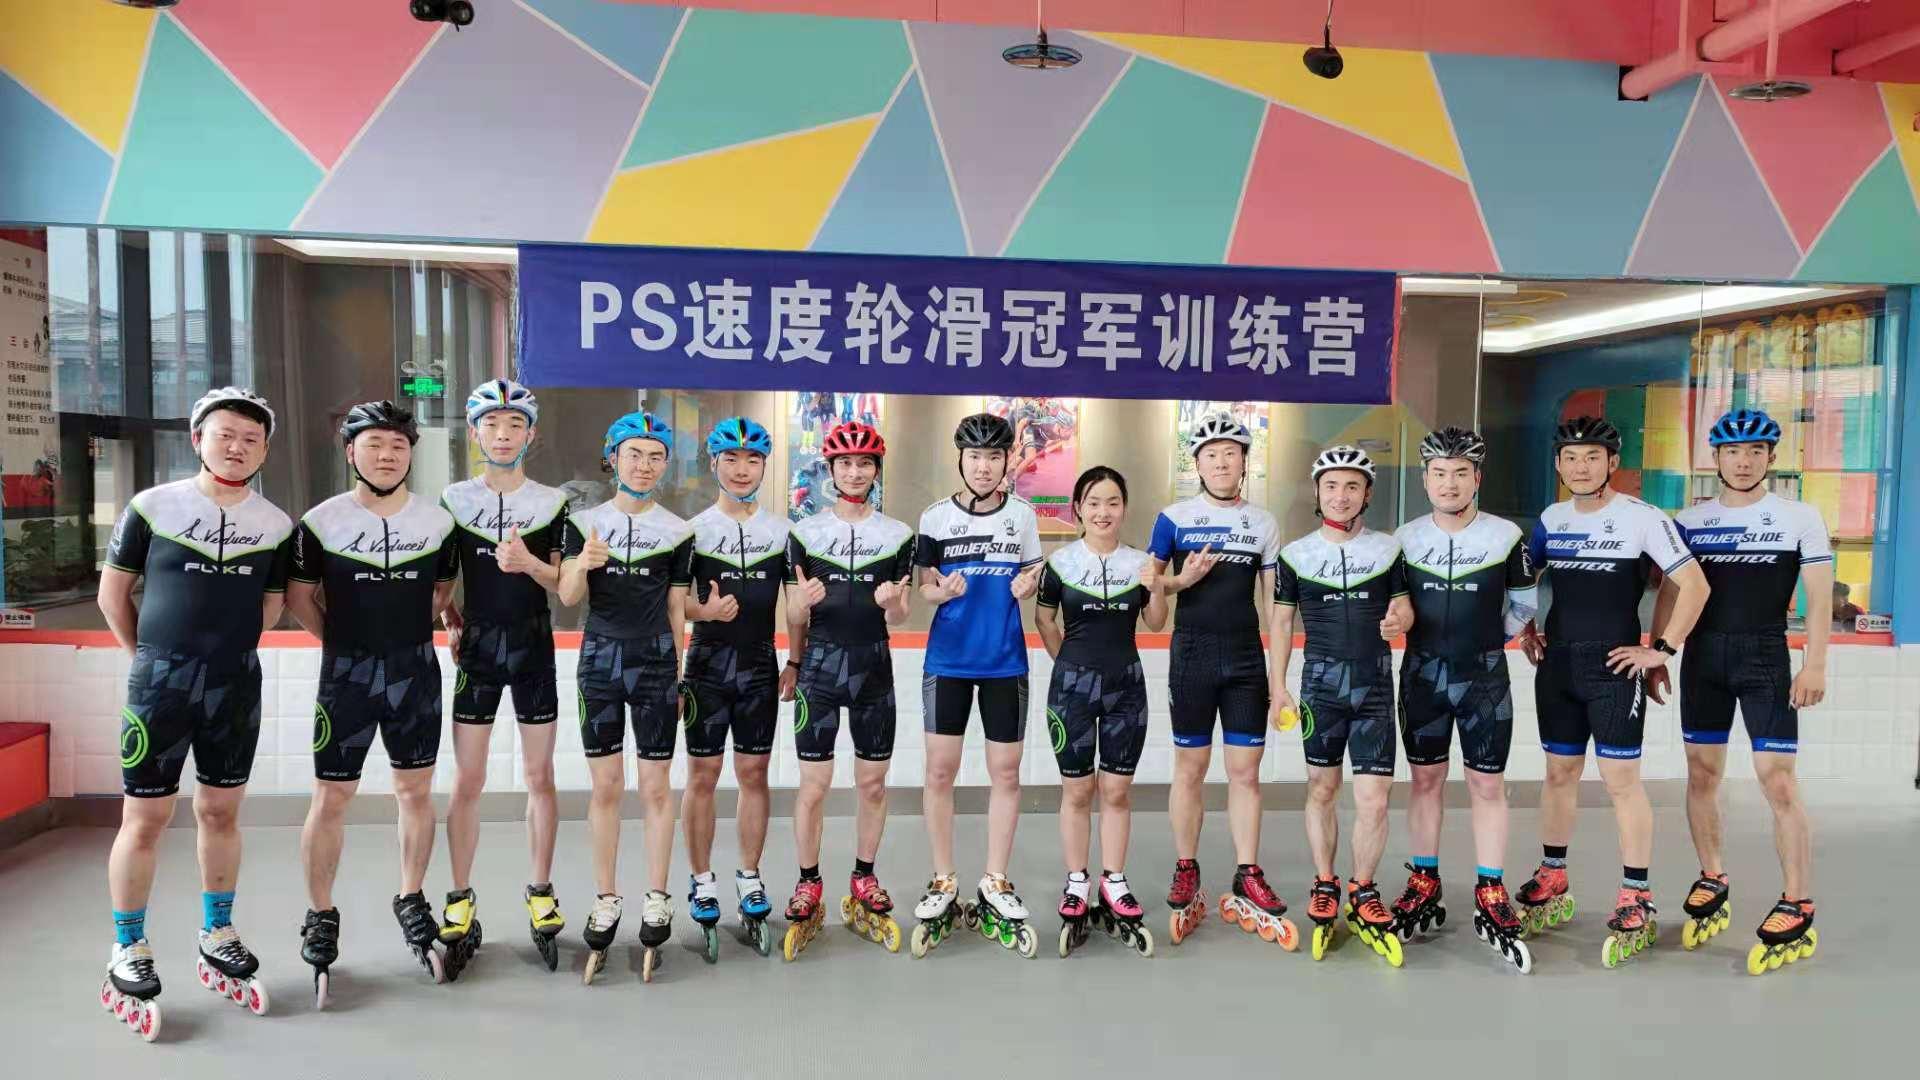 PS速度轮滑冠军训练营—陕西宝鸡站